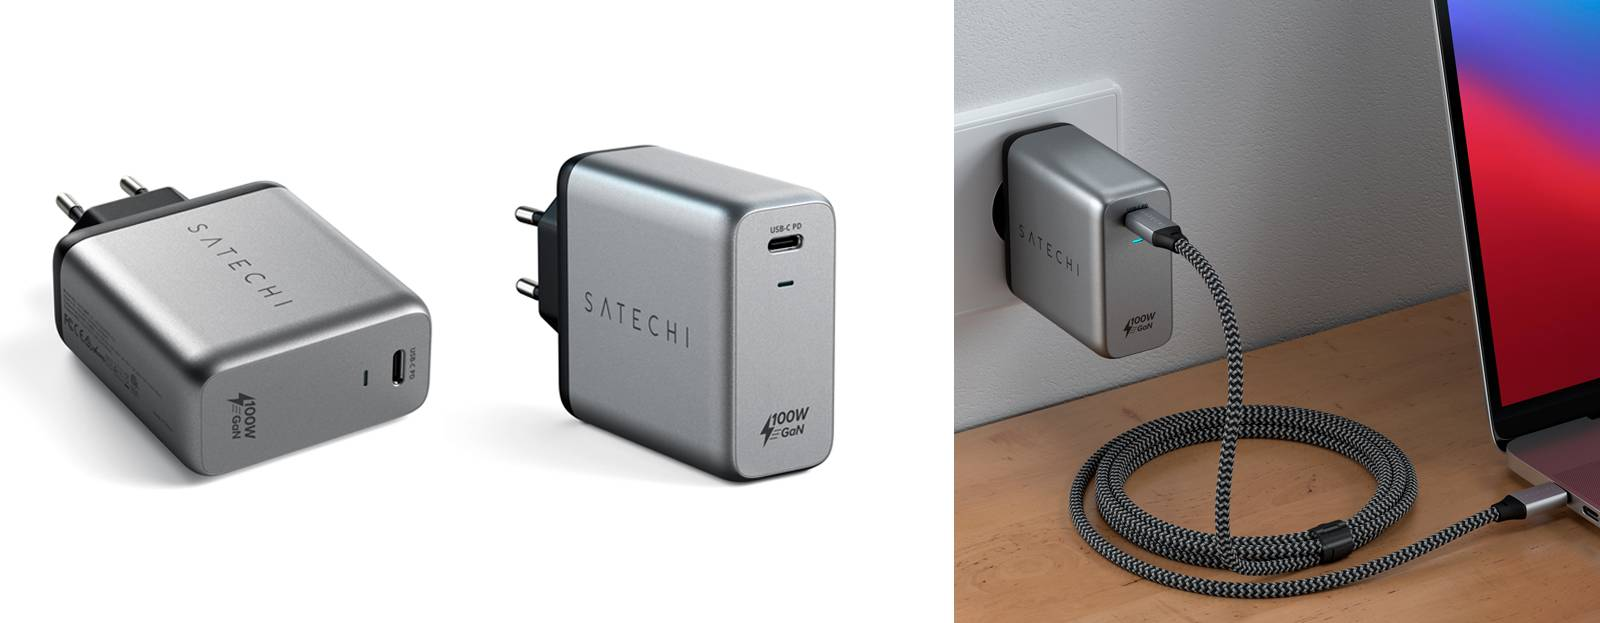 Сетевое зарядное устройство Satechi 100W USB-C PD Wall Chargerll Charger